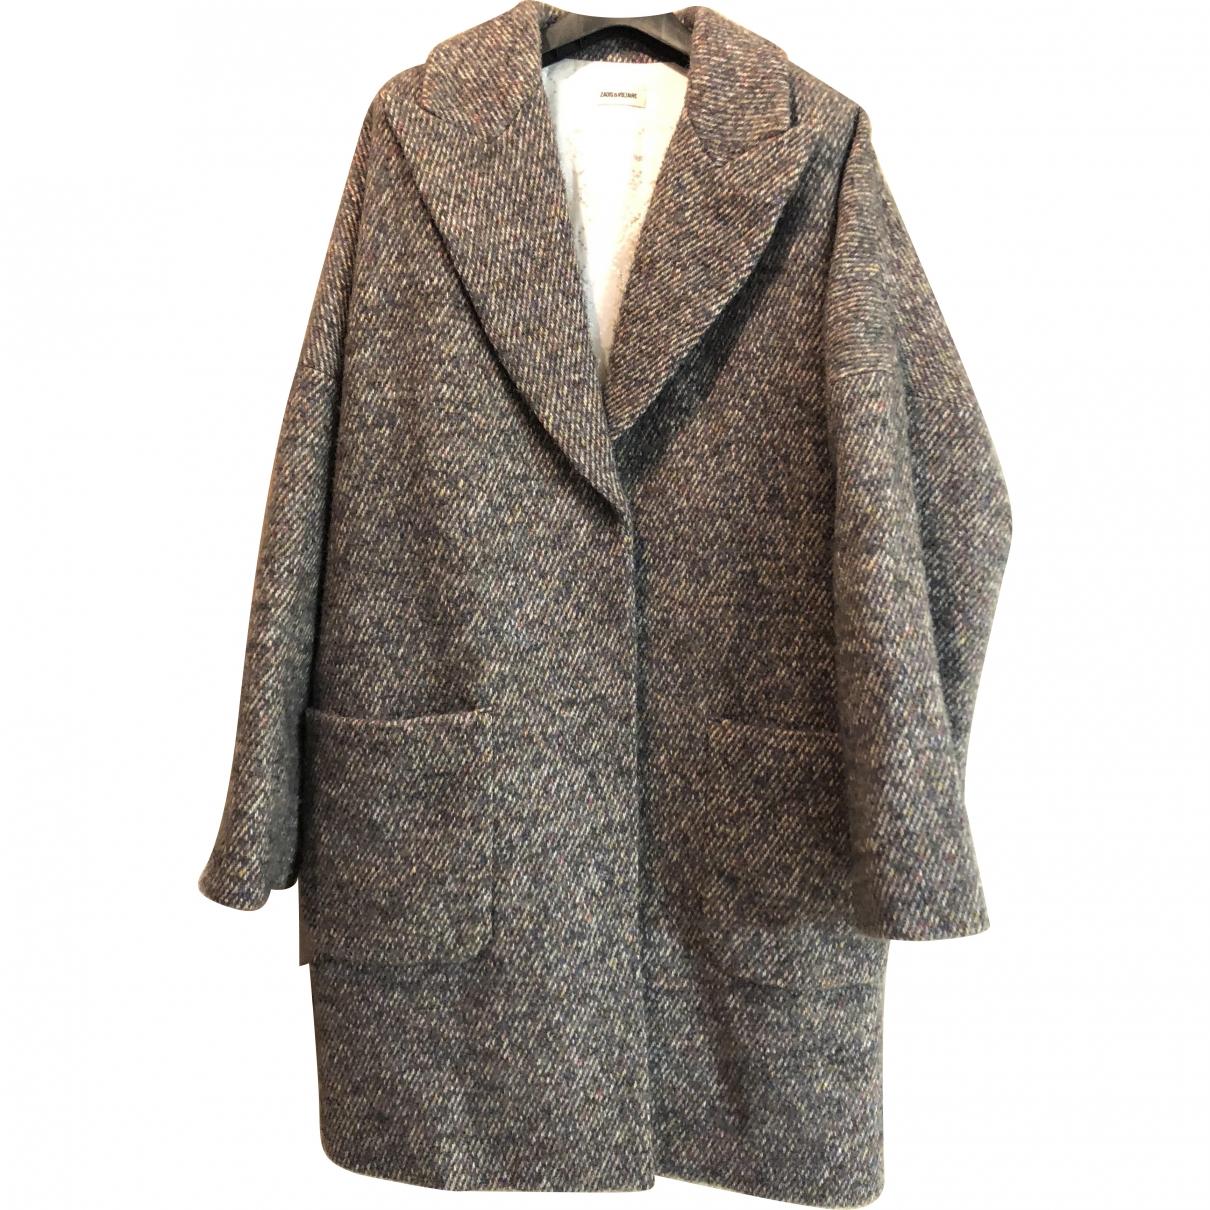 Zadig & Voltaire \N Multicolour Wool coat for Women M International